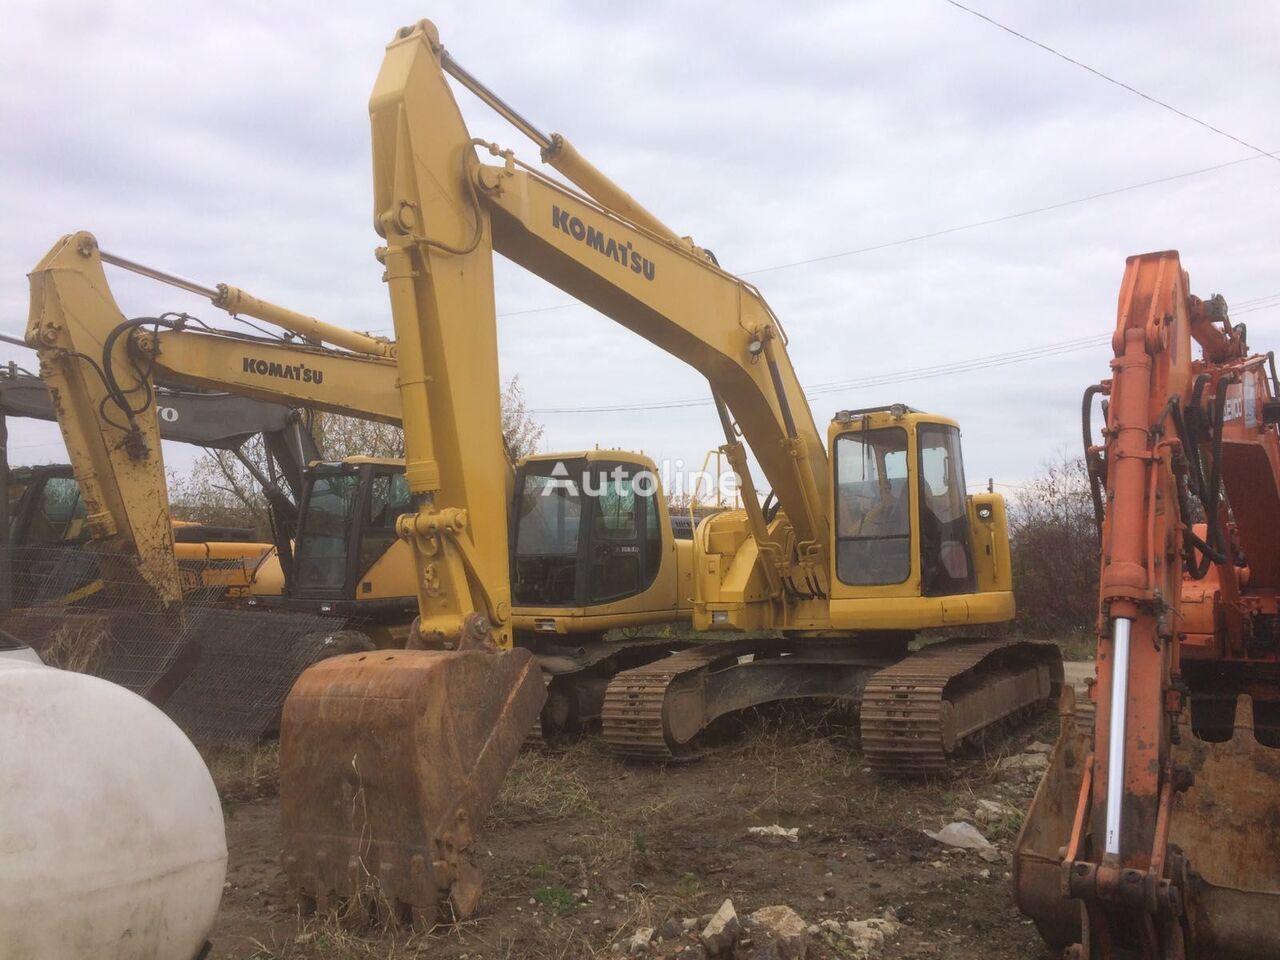 KOMATSU PC 228 All Parts crane arm for excavator